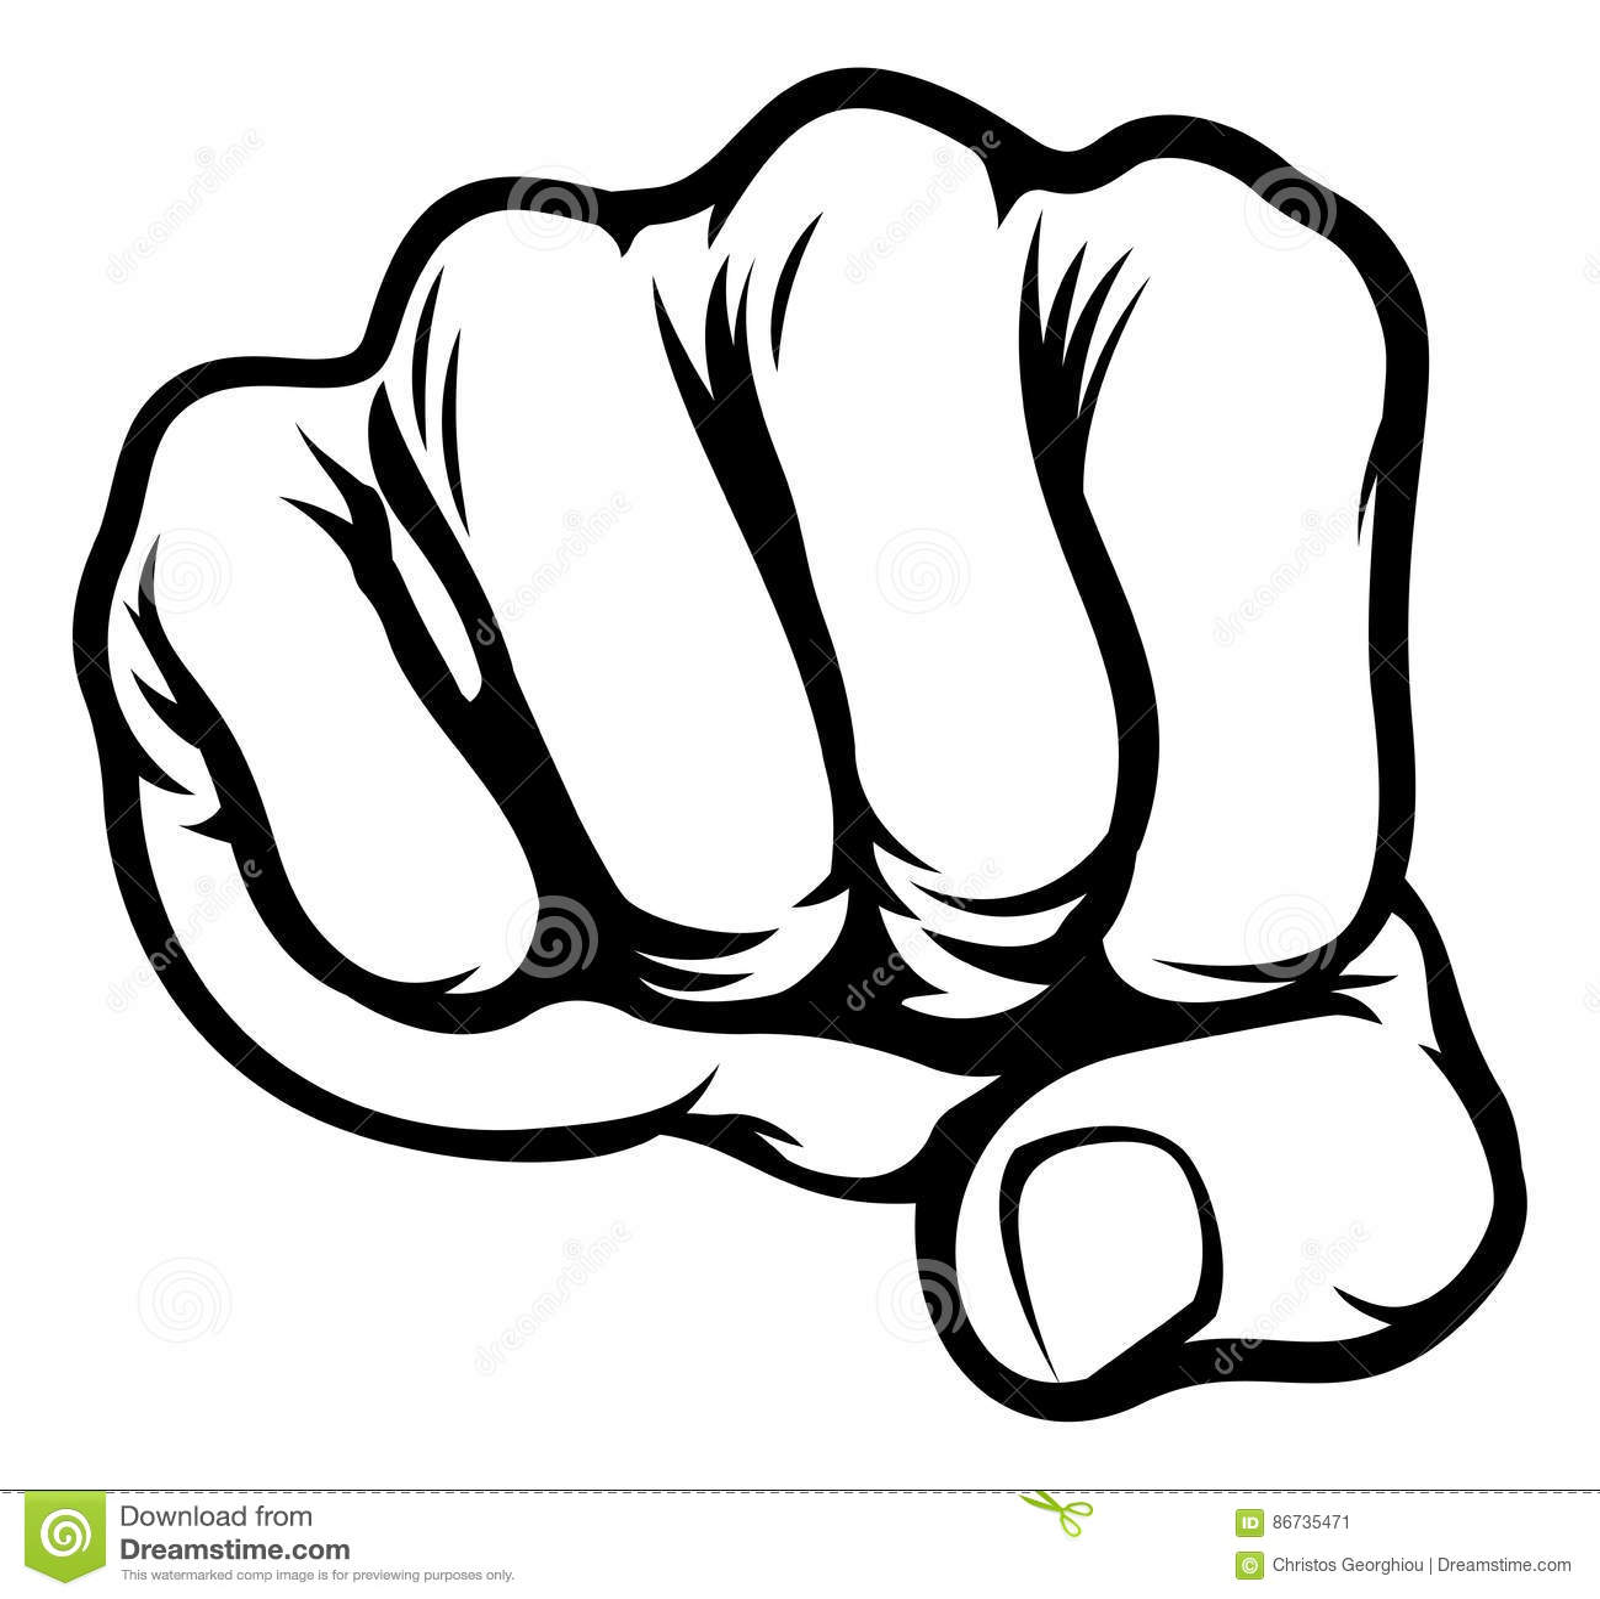 Art of fisting-5791